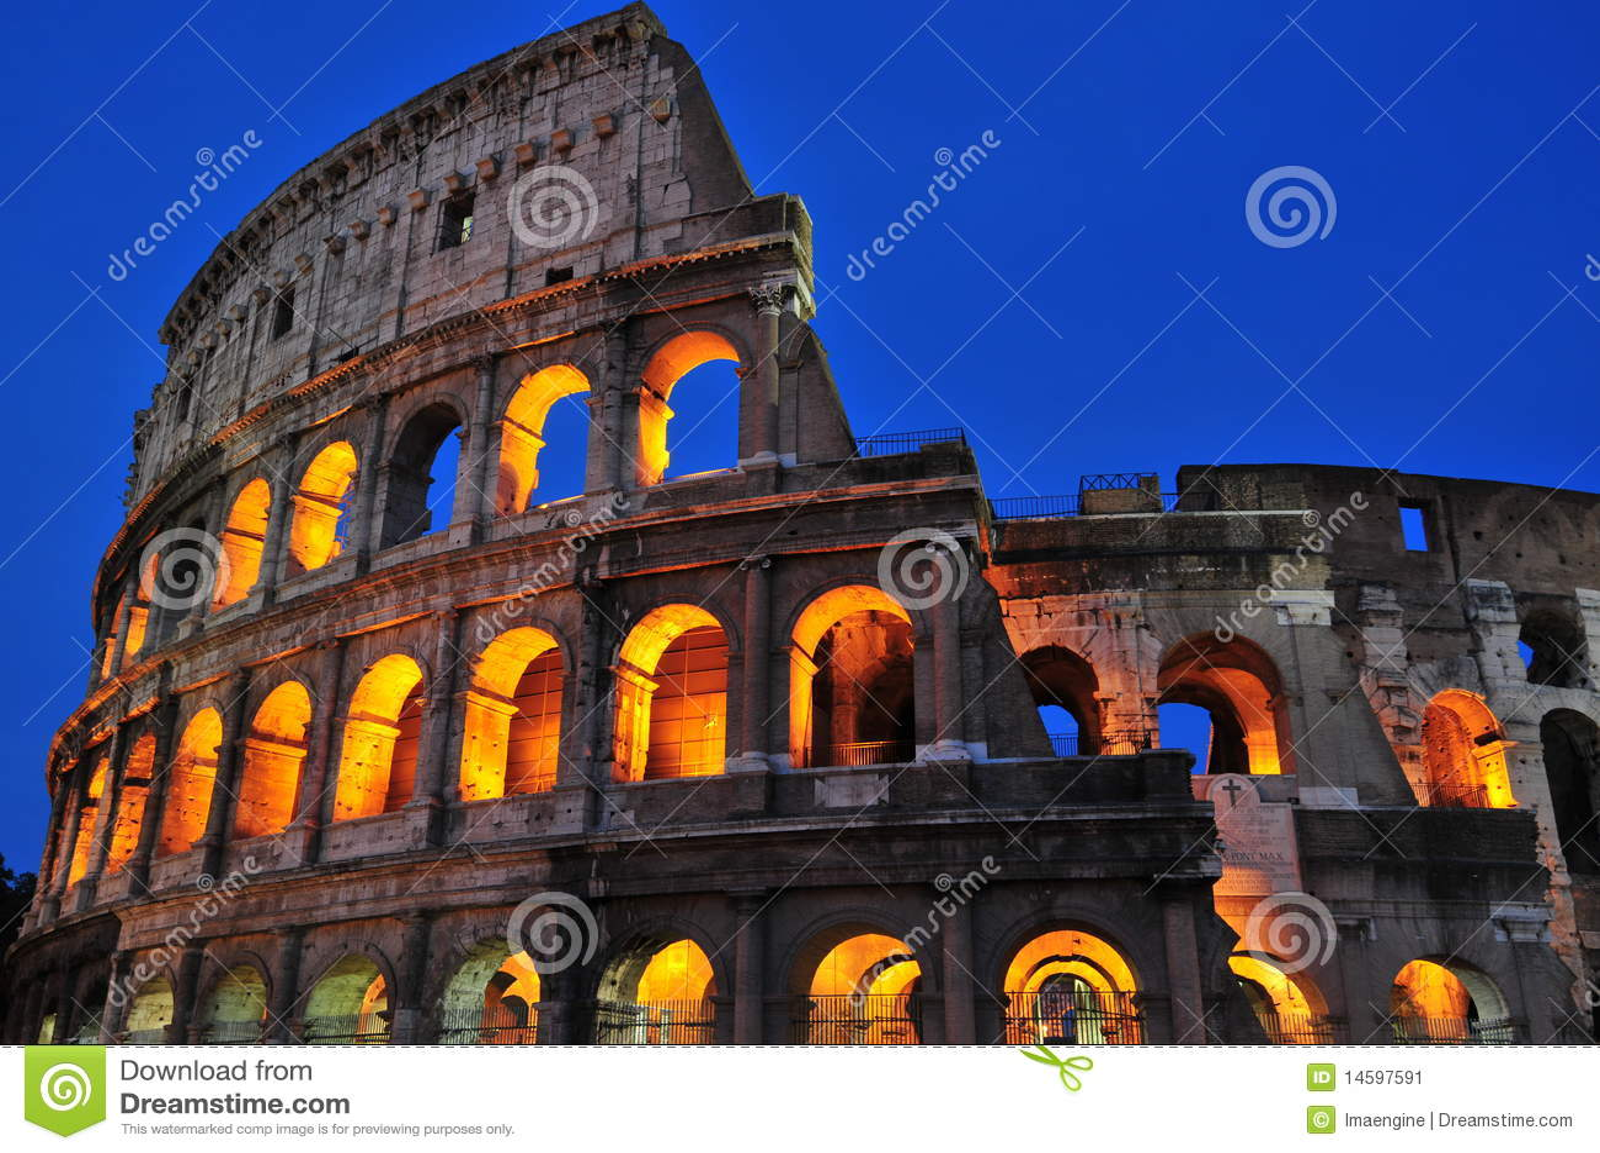 Roman nights (the Coliseum)